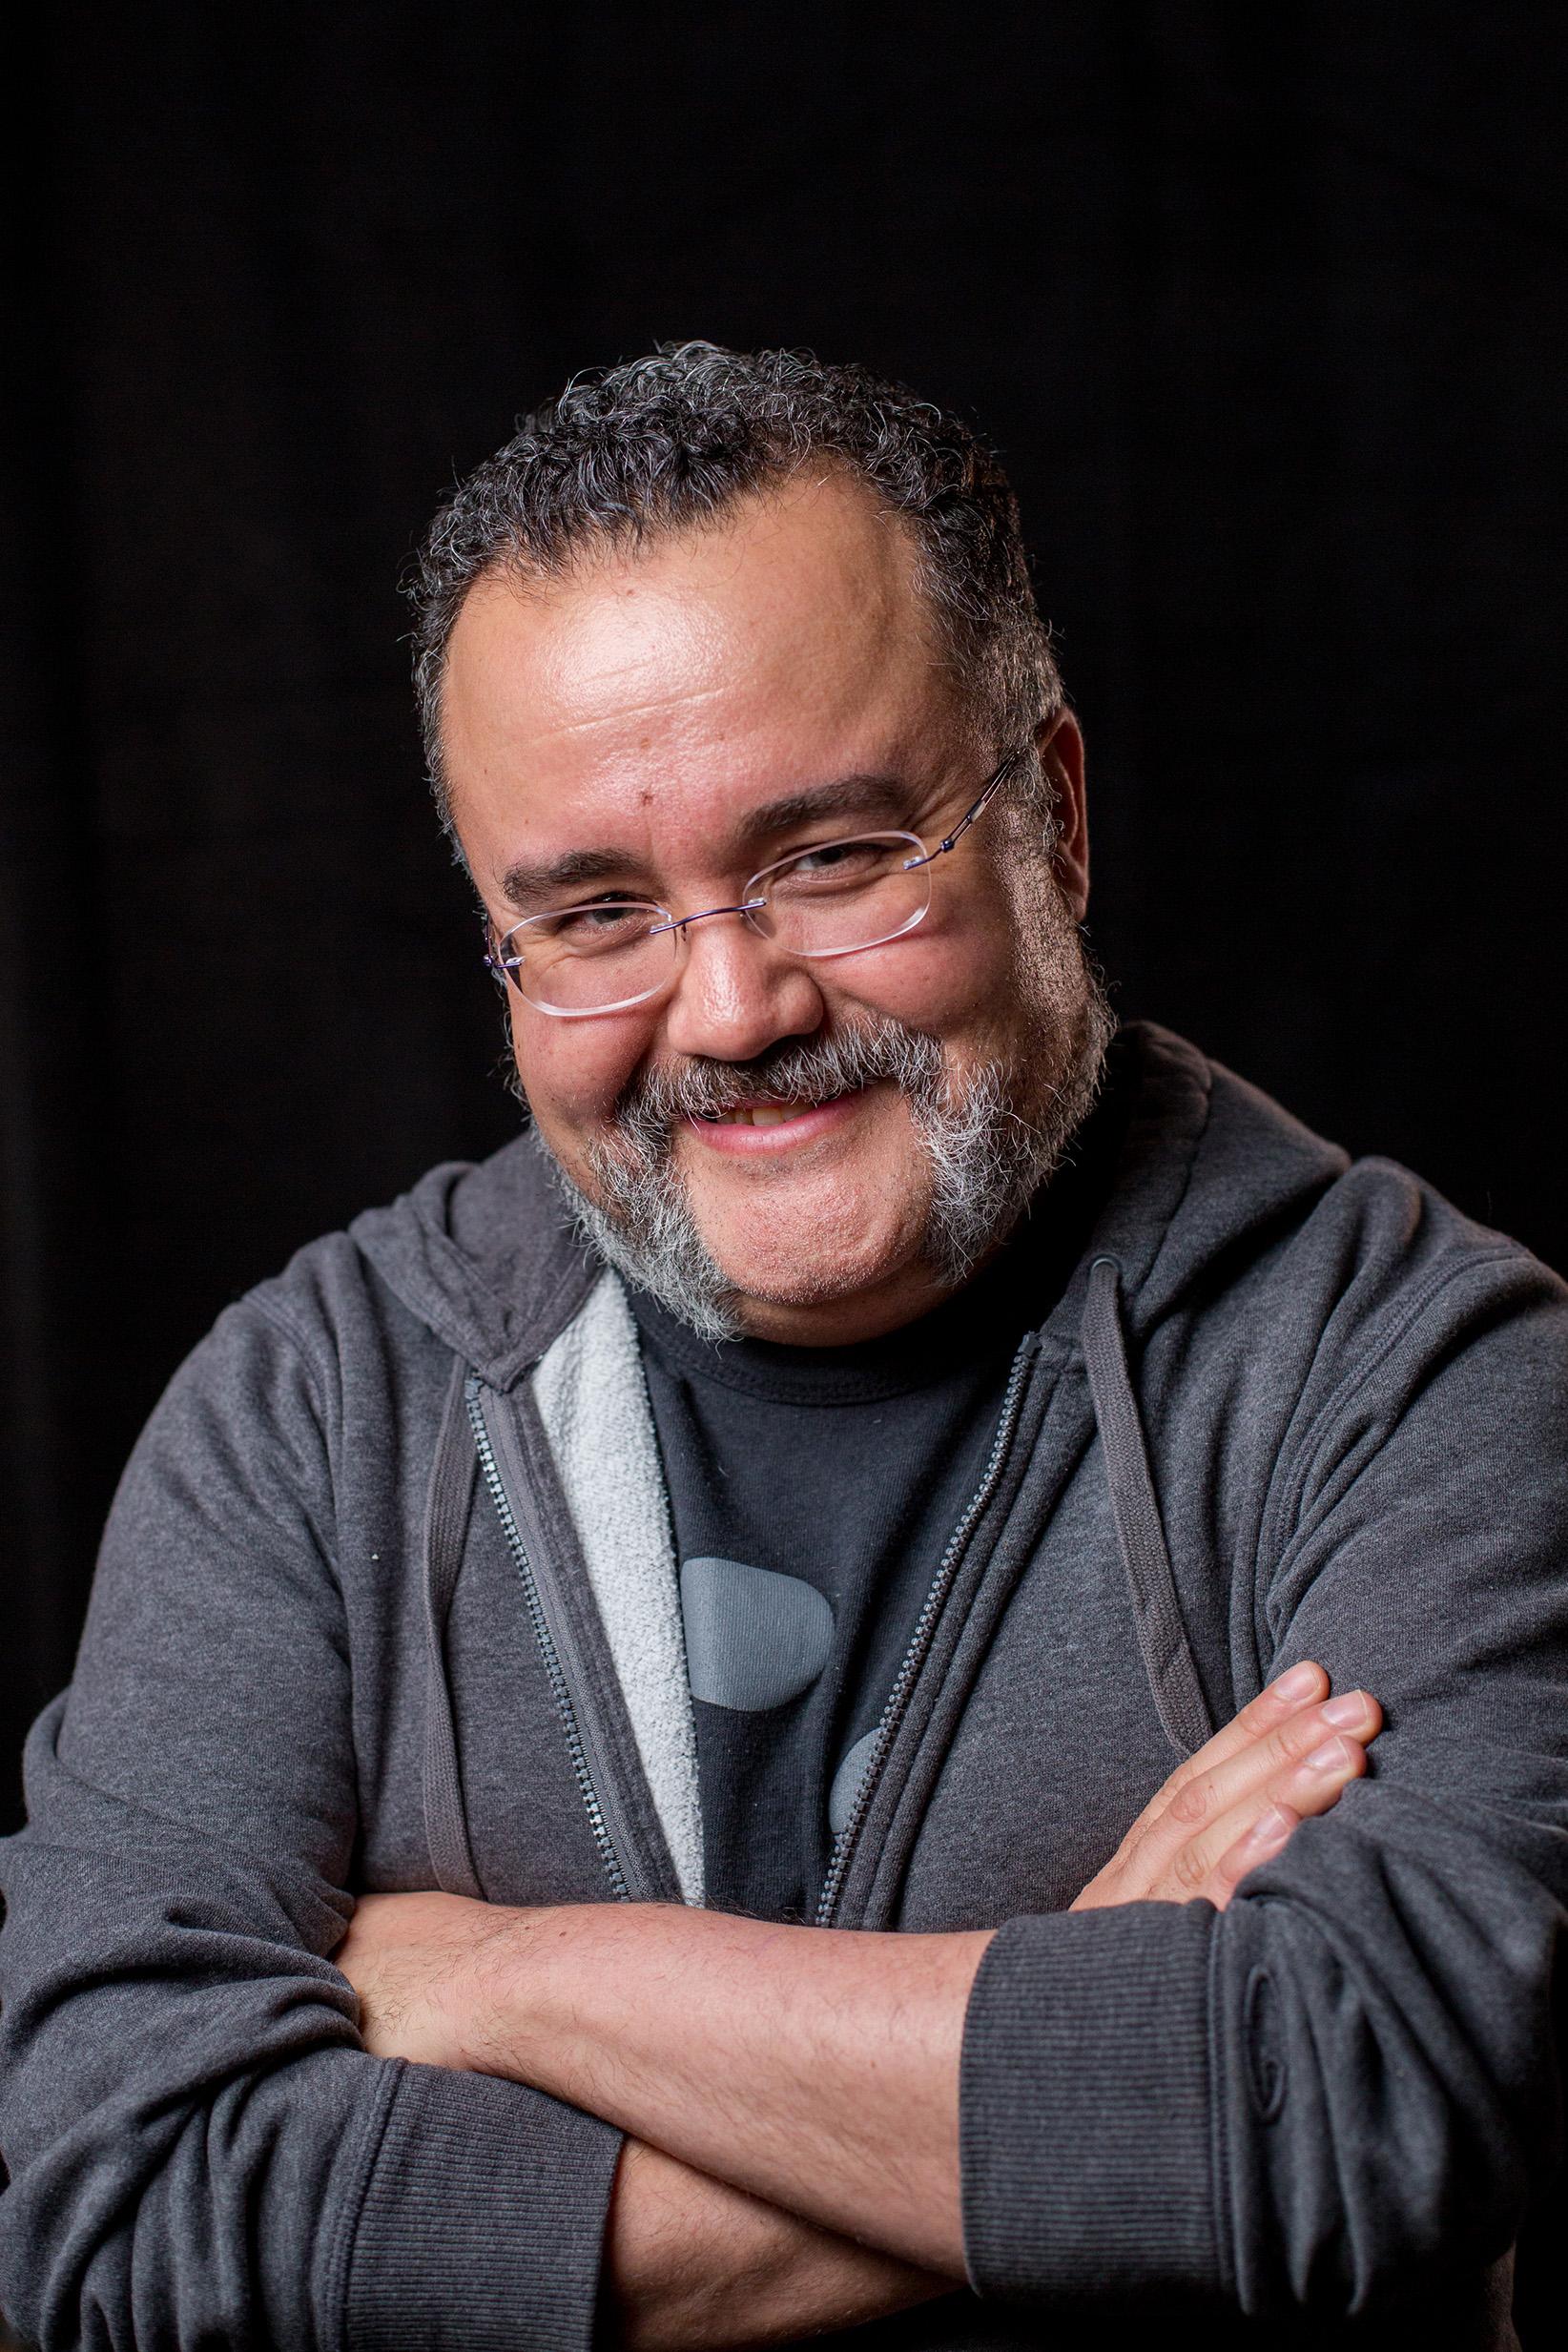 Pablo Hidalgo, Senior Creative Executive, Franchise Story & Content | Lucasfilm